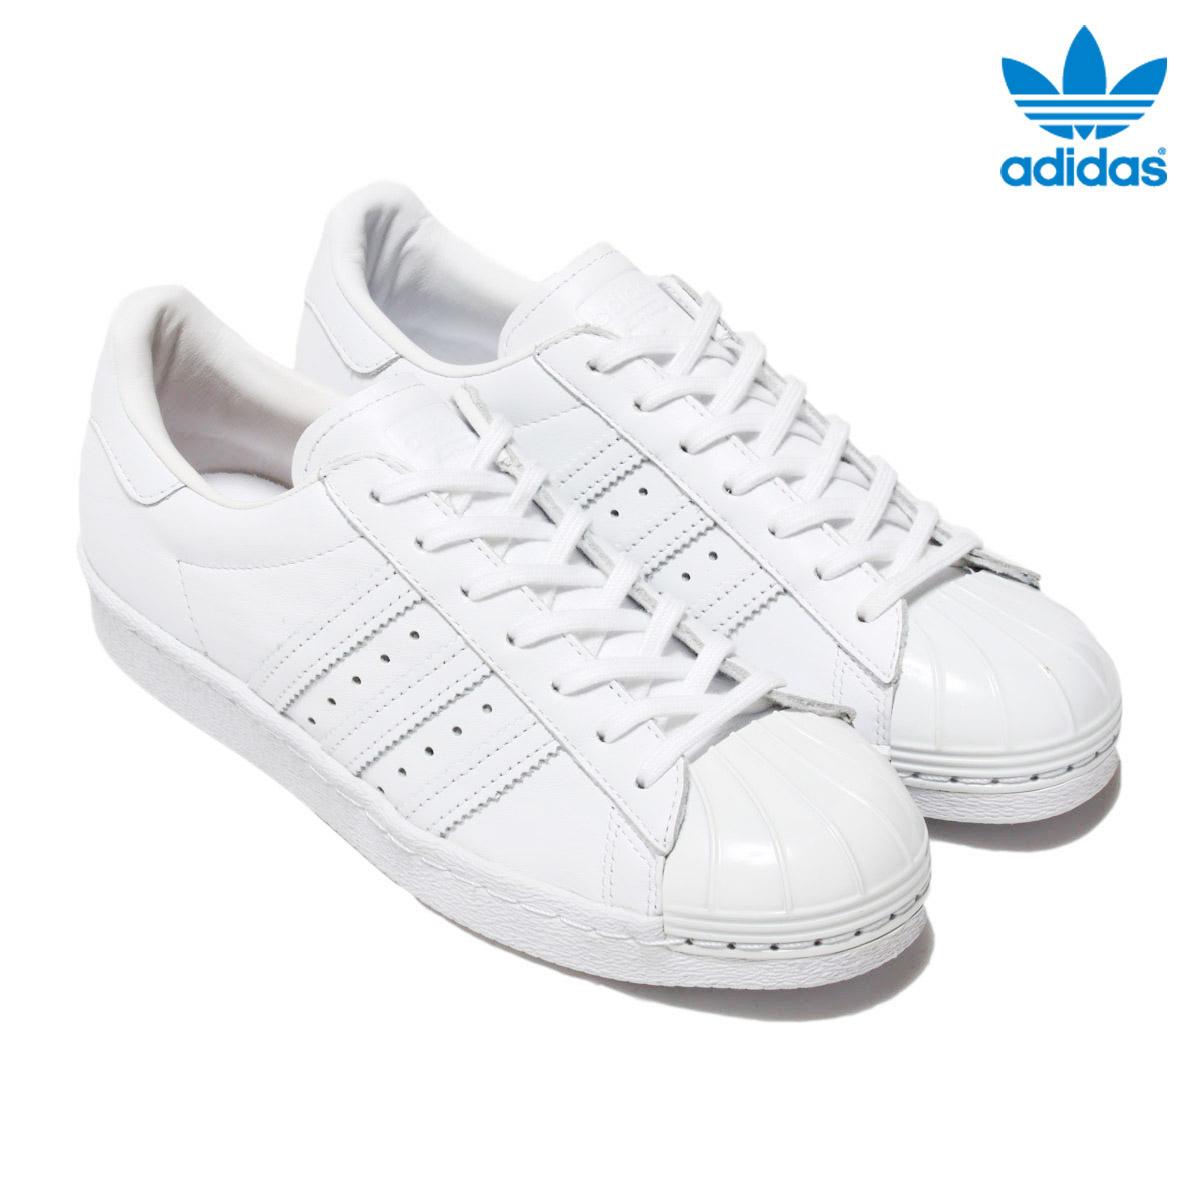 adidas Originals SUPERSTAR 80s METAL TOE W (アディダス オリジナルス スーパースター80s メタル トゥー) Running White/Running White/Core Black【レディース】【スニーカー】16FW-I